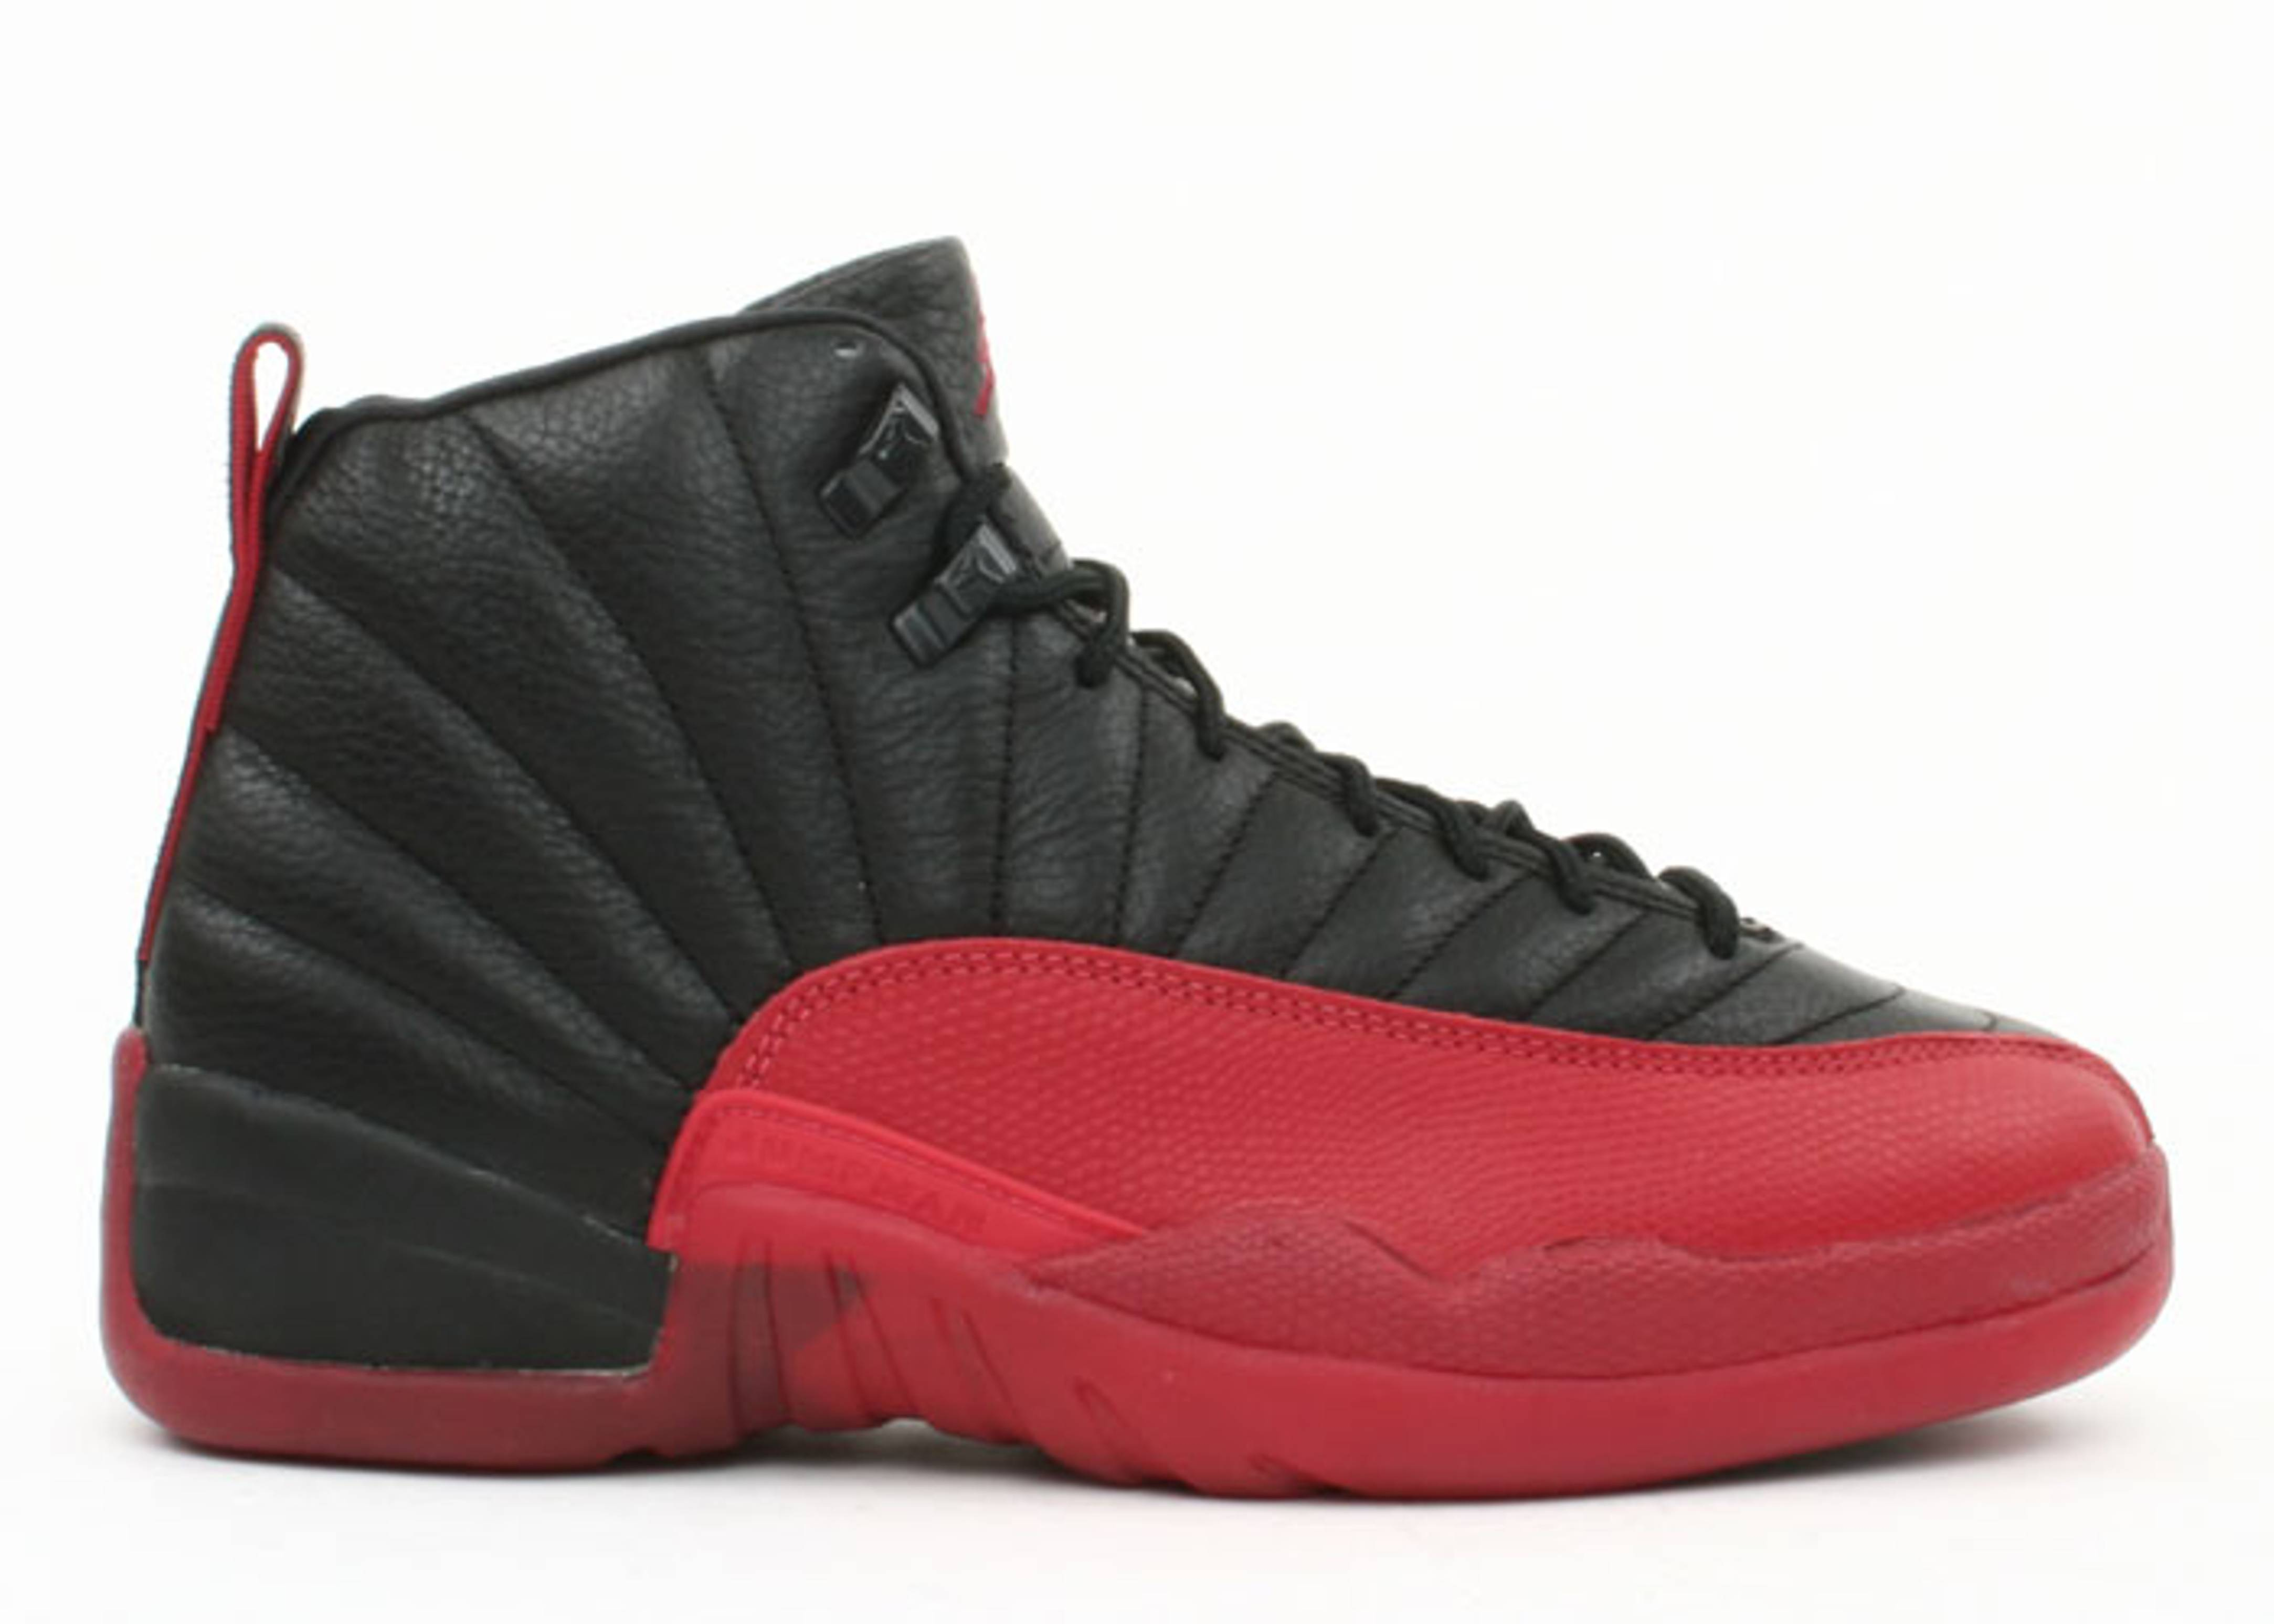 ... jumpman red black; air jordan 12 (og) black varsity red air jordans  flight club ...